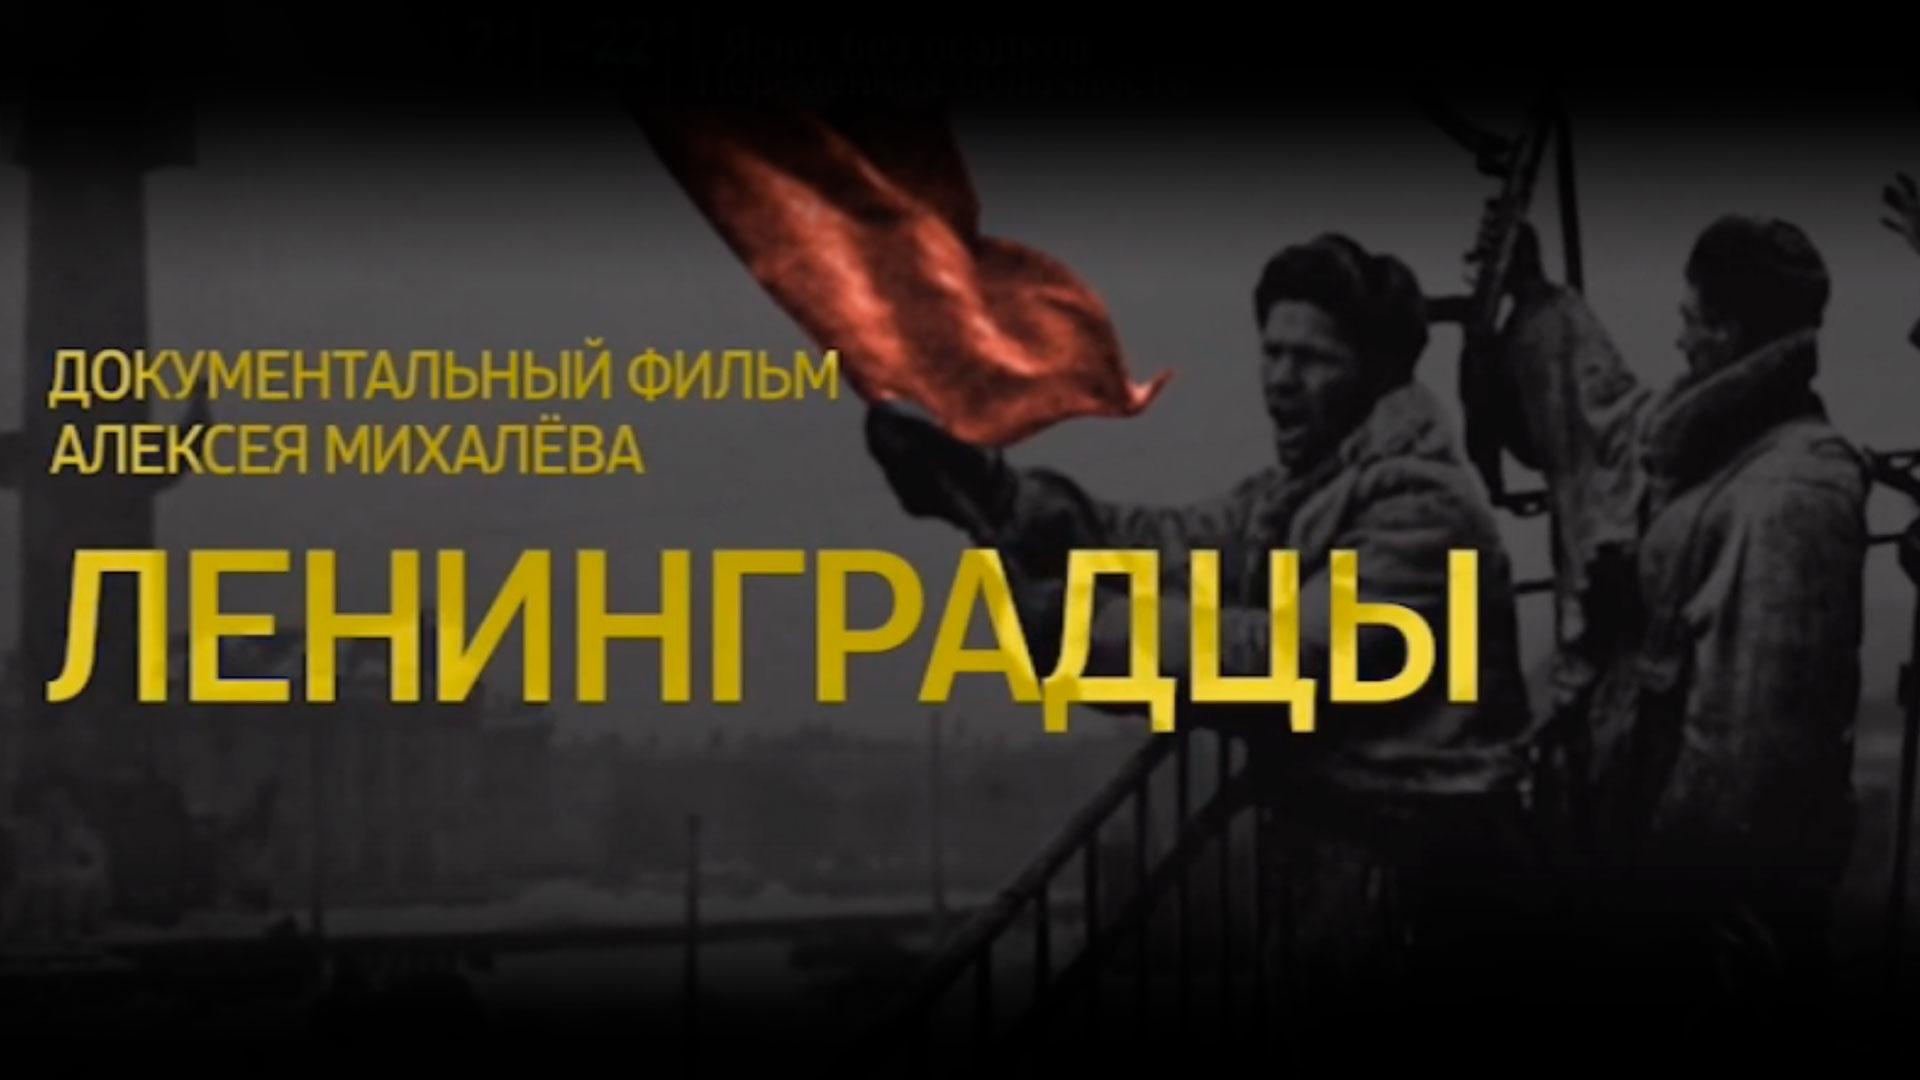 Ленинградцы